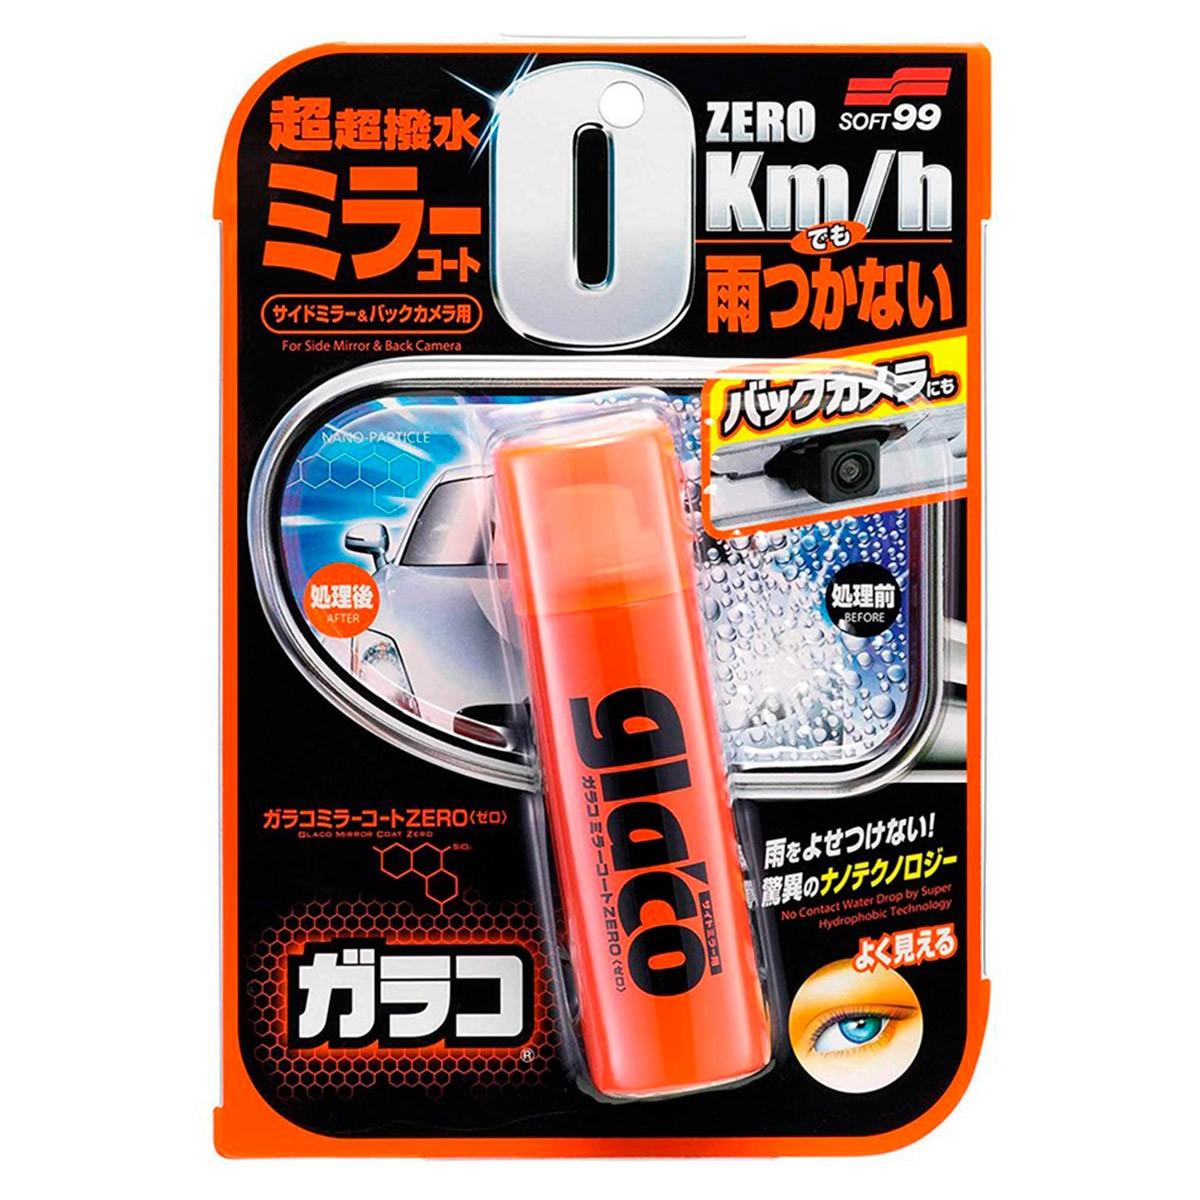 Glaco Zero Spray para Retrovisores 80ml - Soft99